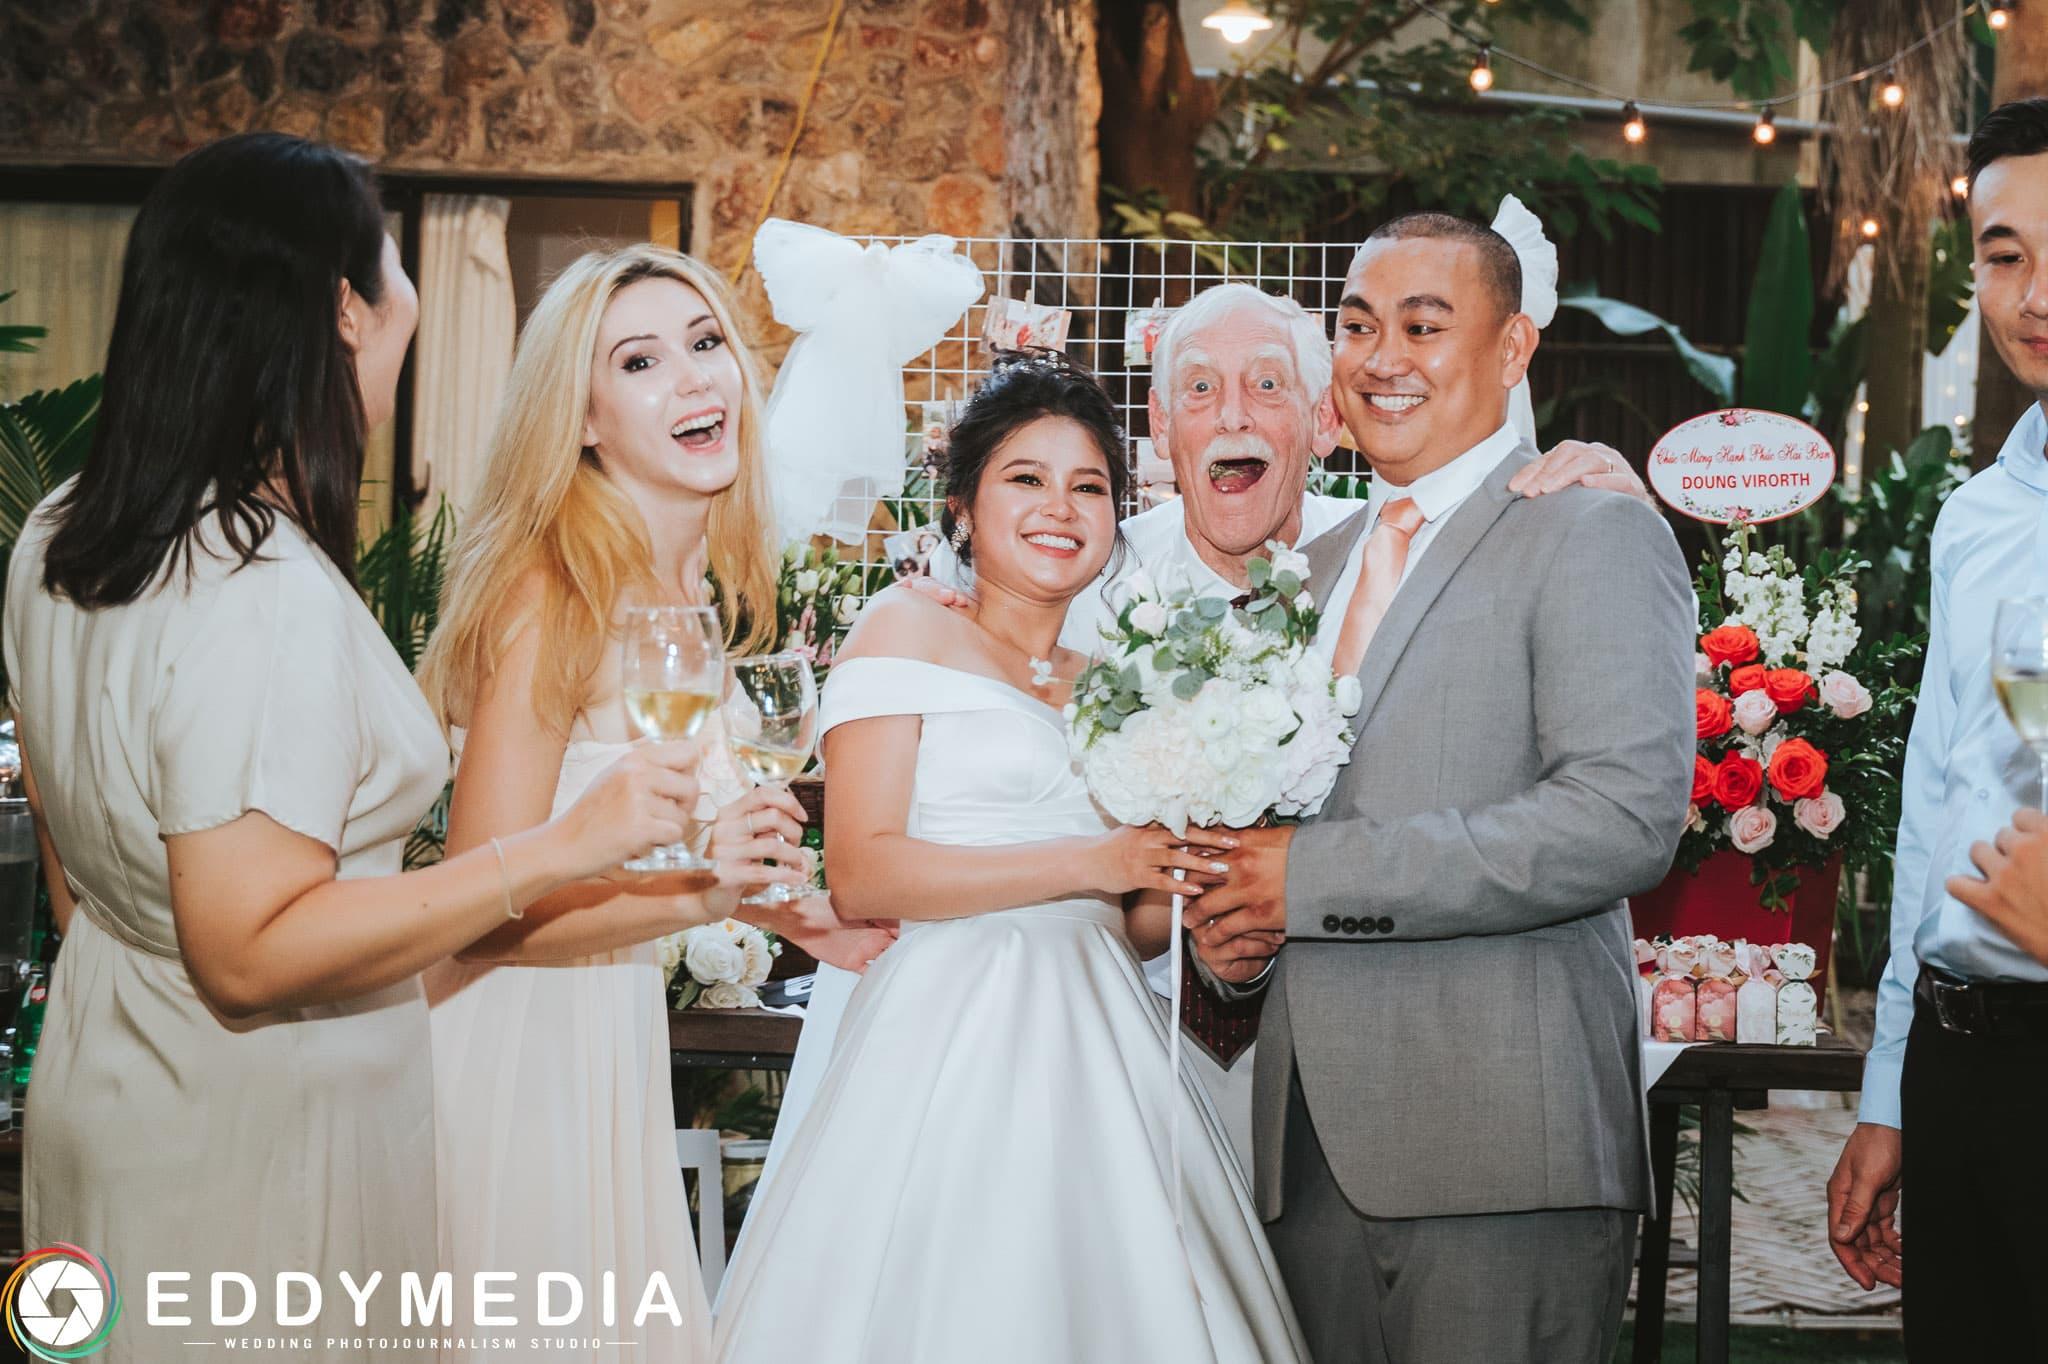 Phongsucuoi James KieuThuy EddyMedia 47 tiệc cưới ngoài trời